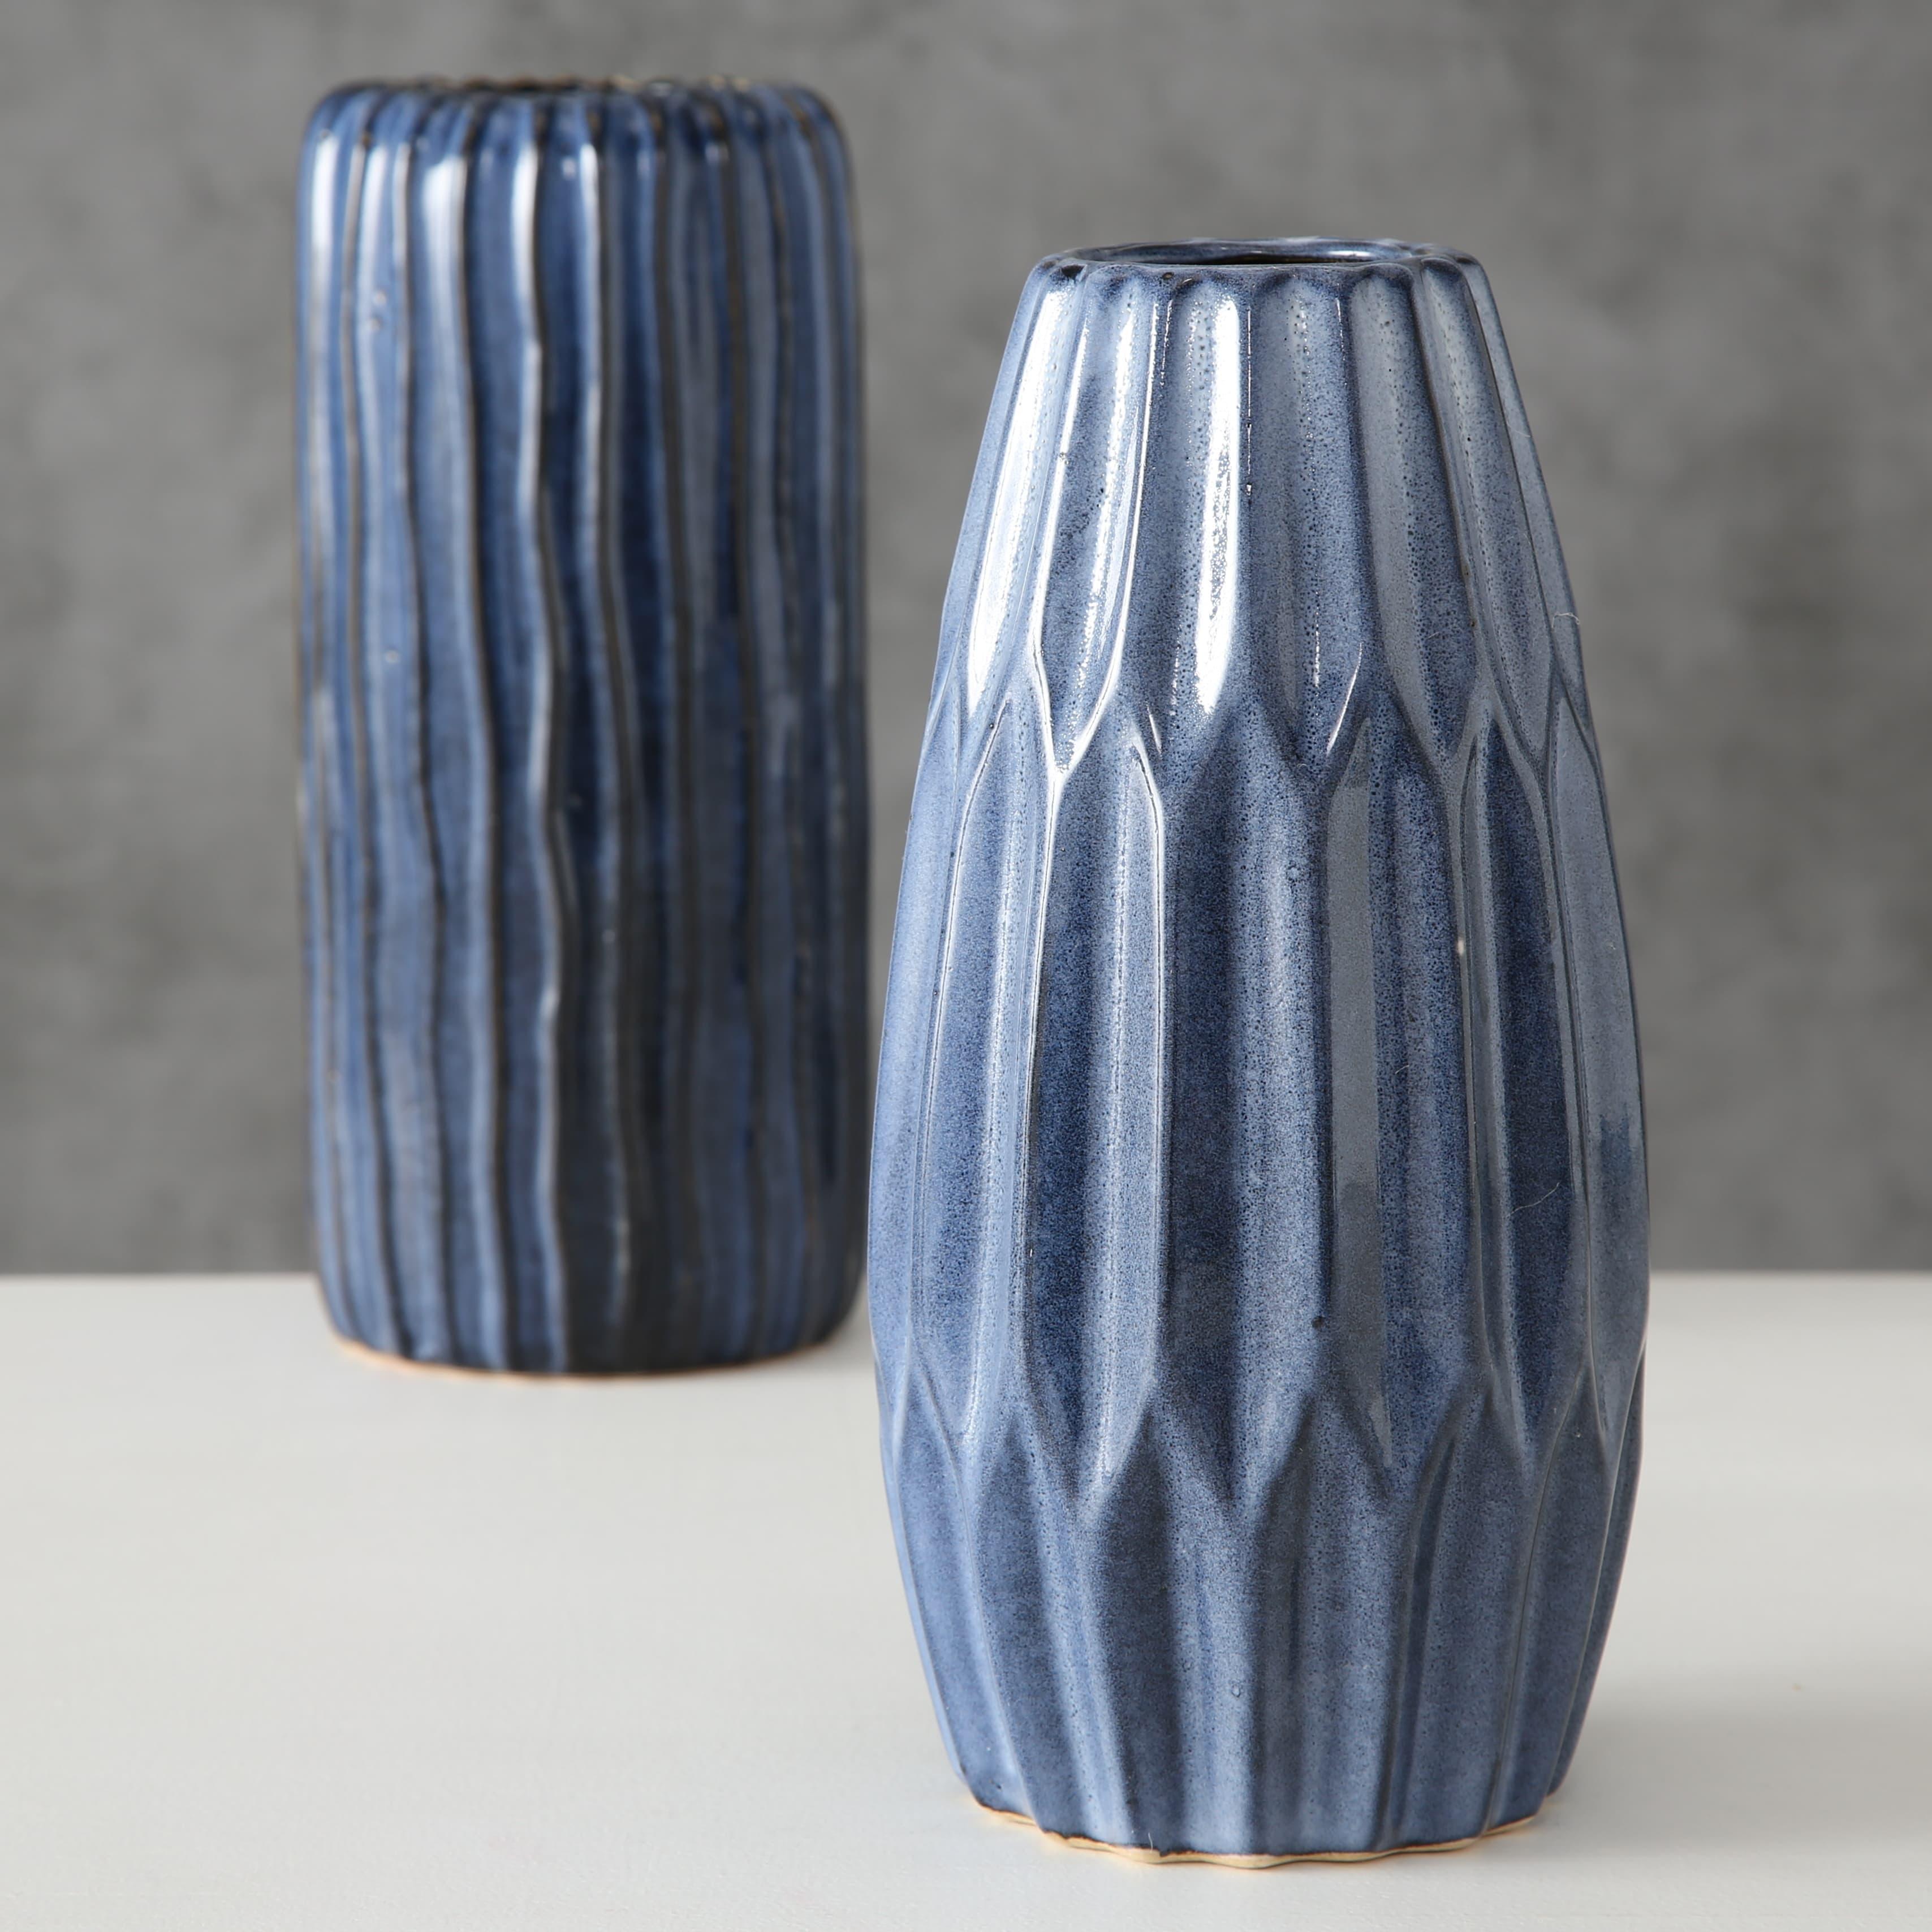 Vaza decorativa din portelan Aquarel Albastru, Modele Asortate, Ø10xH24 cm poza